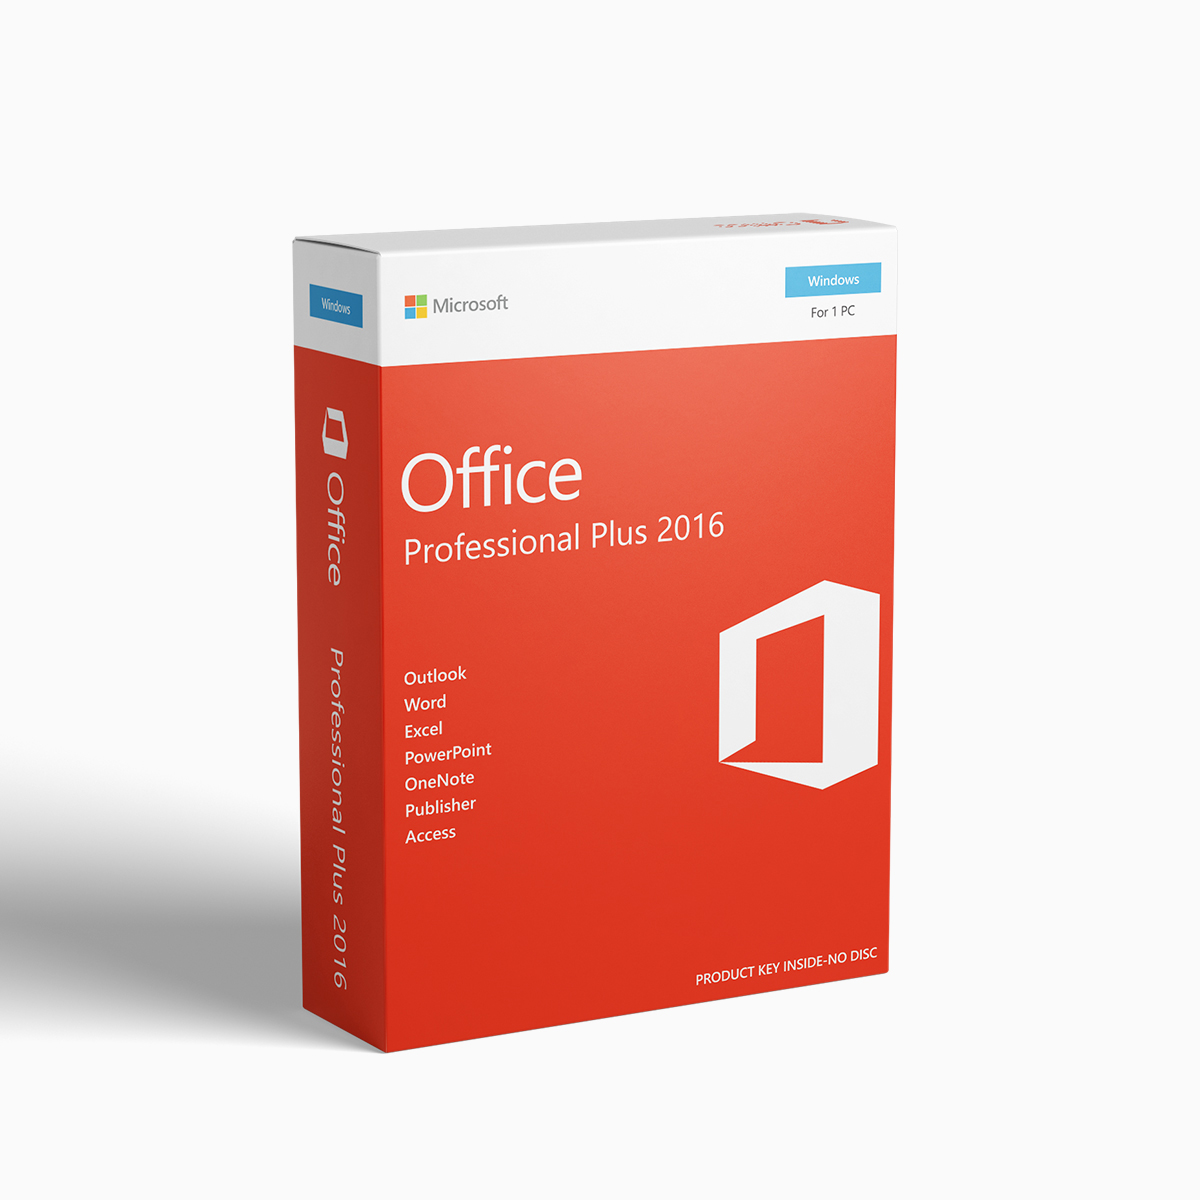 Microsoft Office Professional Plus 2016 (Windows)